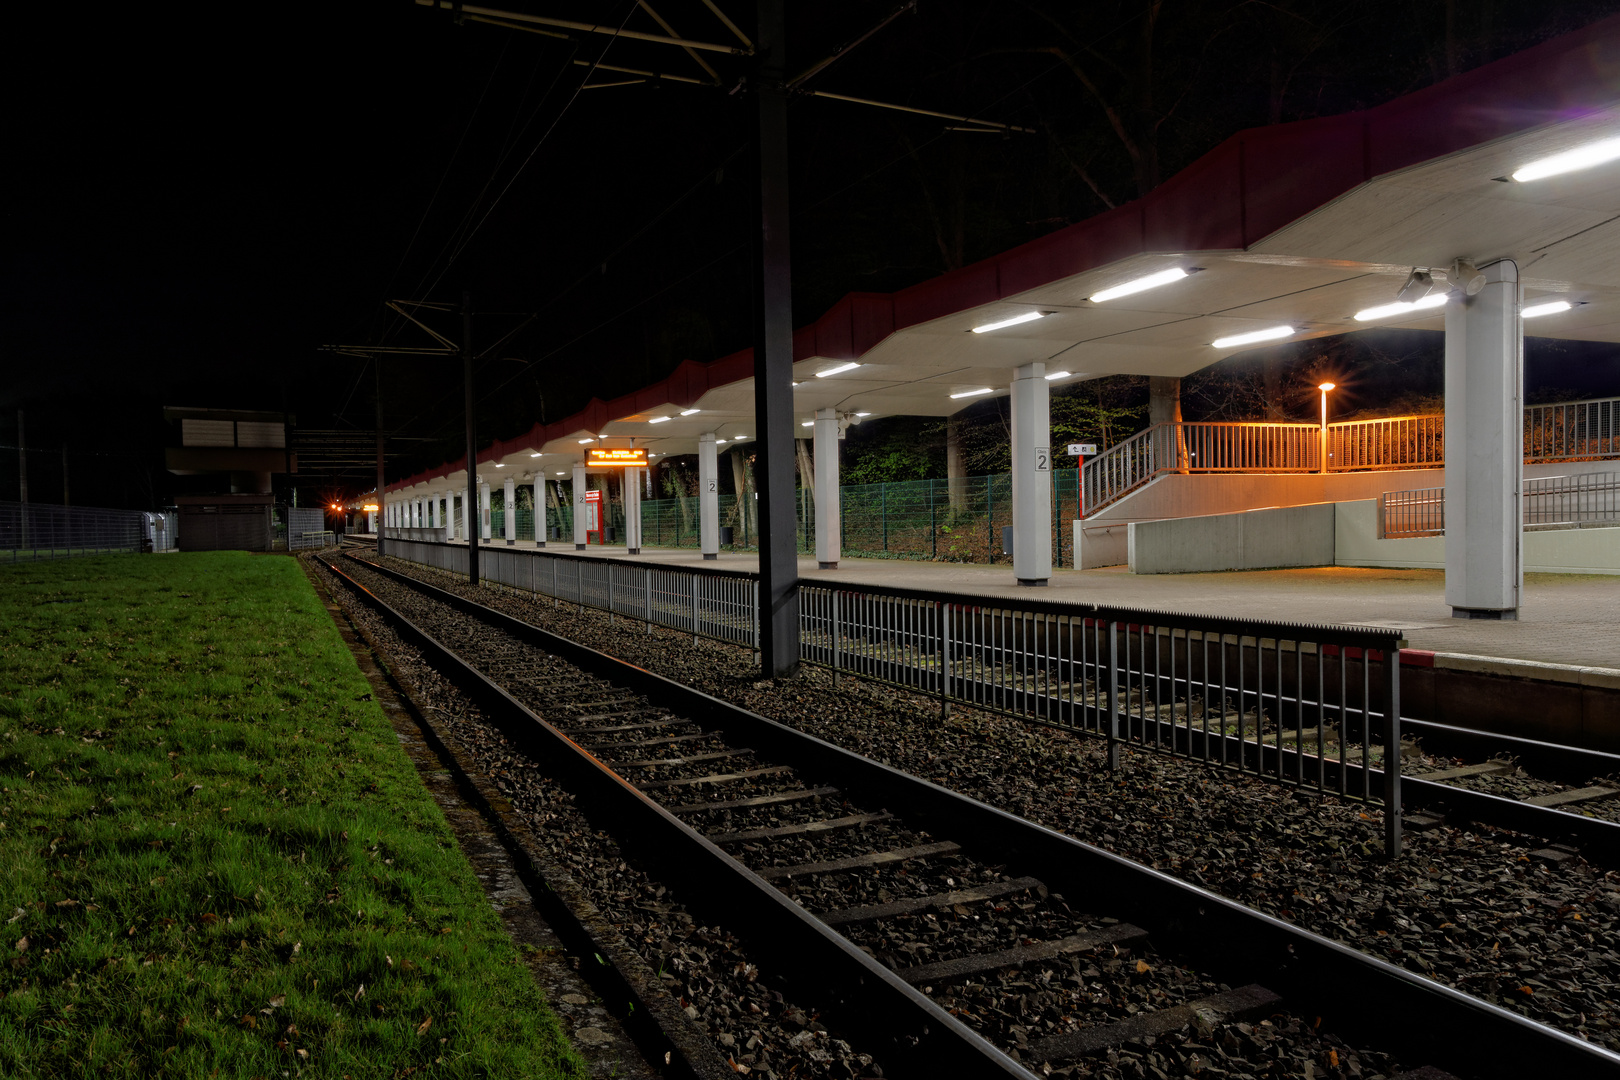 Haltestelle Rhein-Energie-Stadion